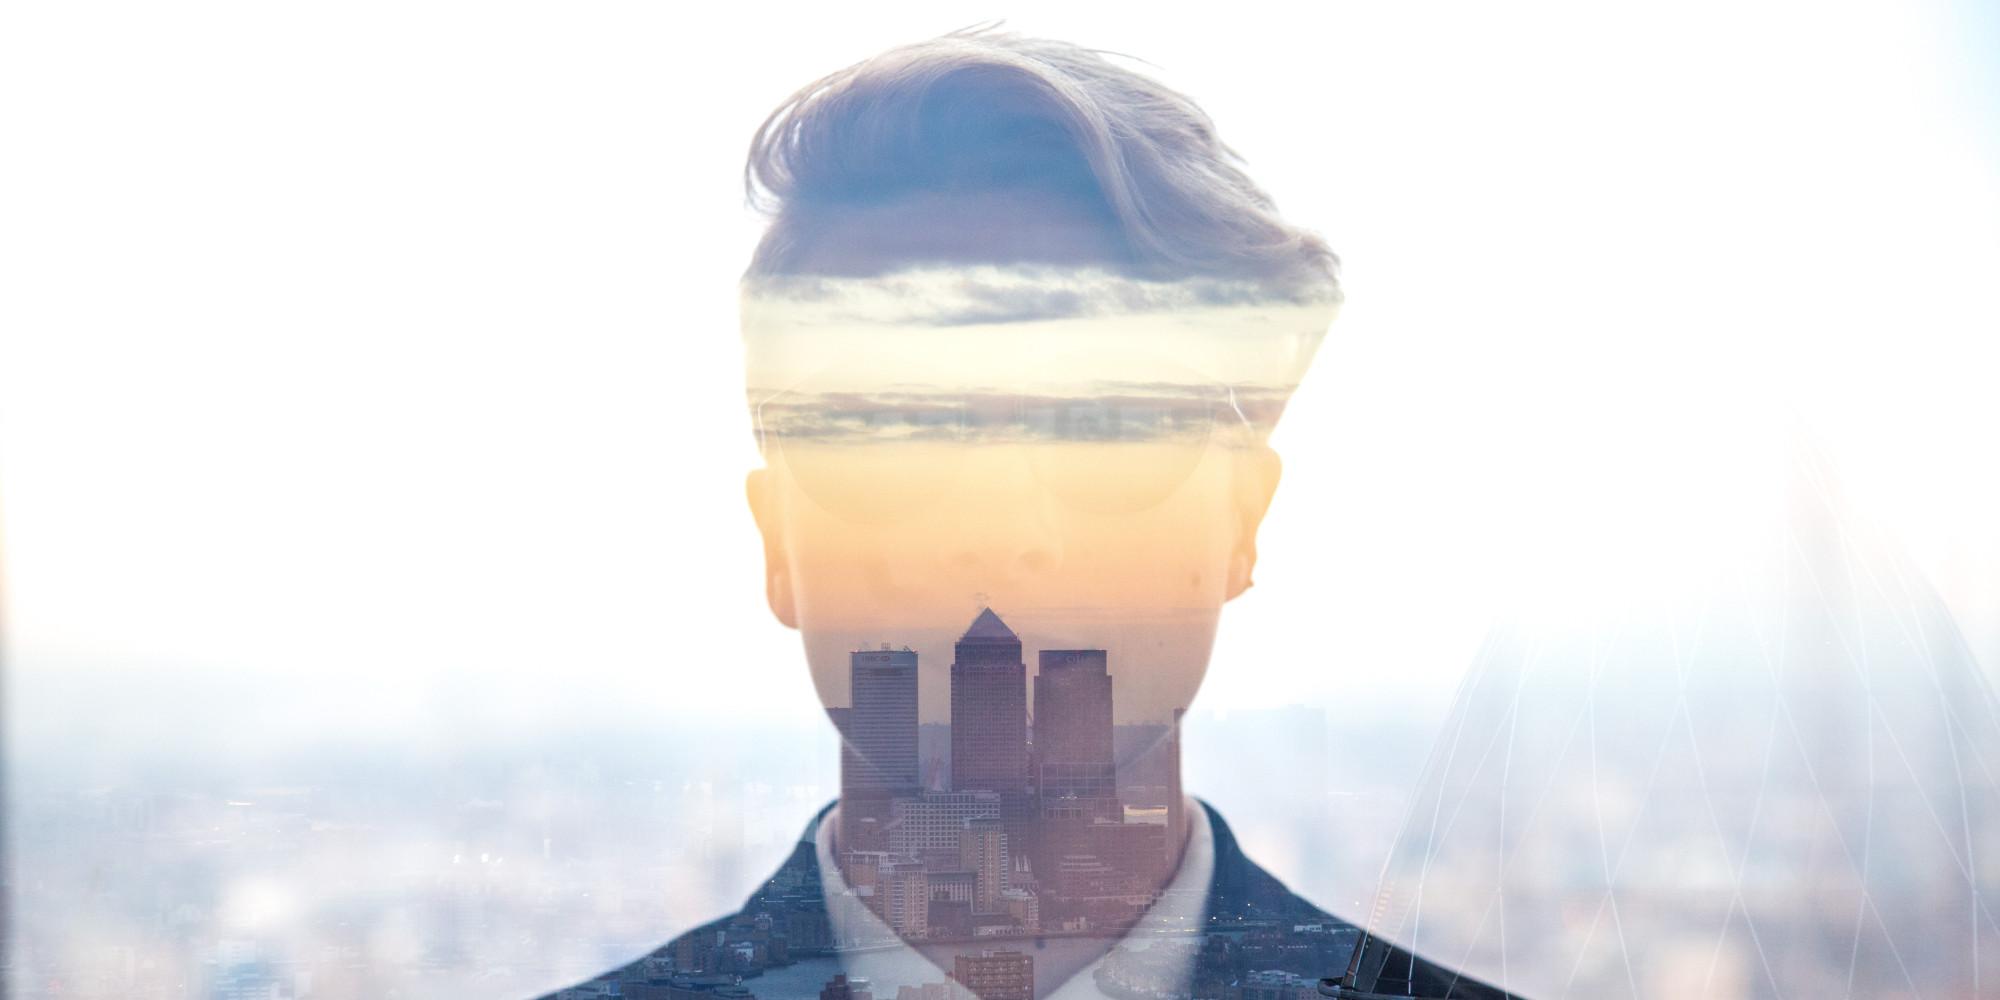 o-man-thinking-silhouette-facebook.jpg